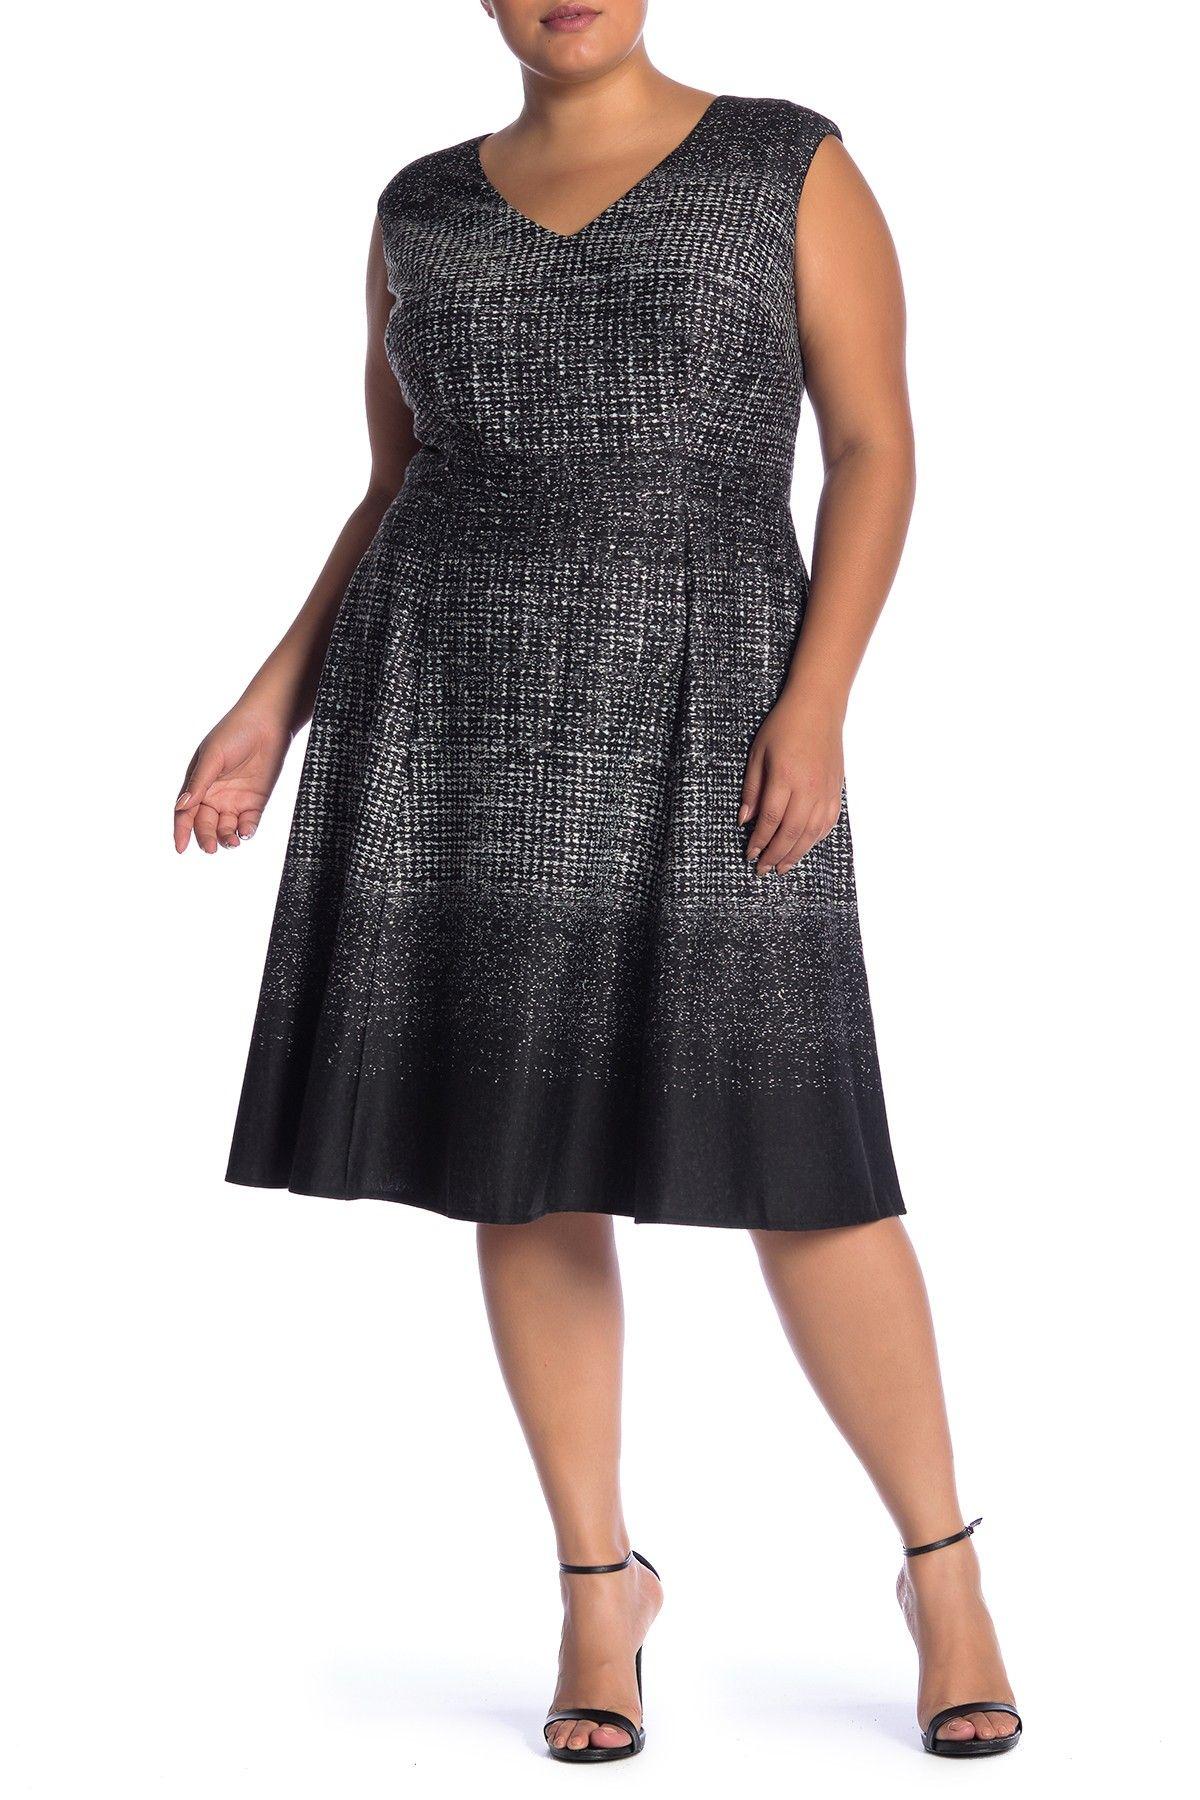 V Neck Fit Flare Dress Plus Size By London Times On Nordstrom Rack Fit Flare Dress Plus Size Dresses Plus Size Cocktail Dresses